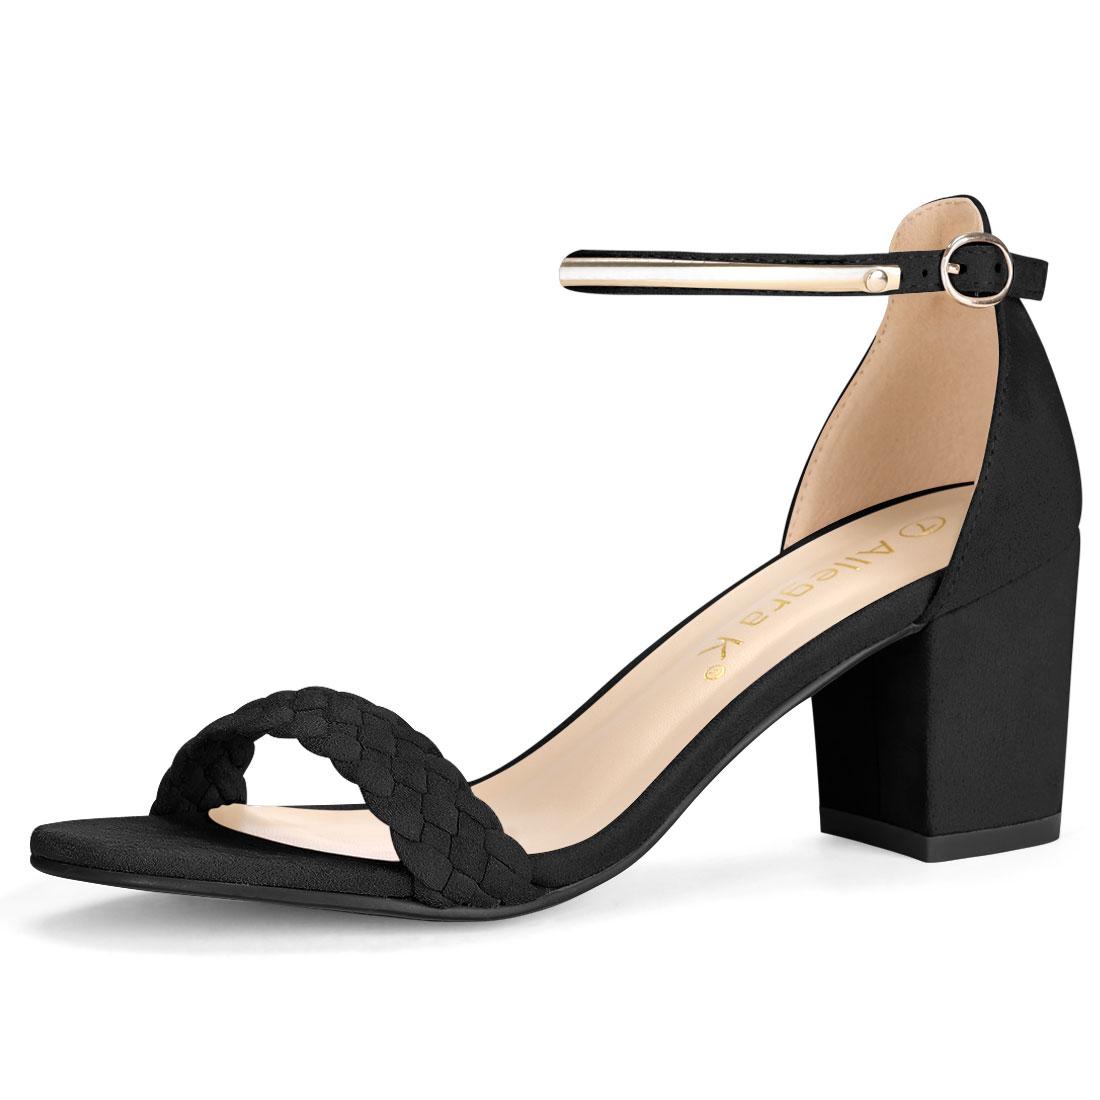 Women Open Toe Mid Heel Braided Ankle Strap Sandals Black US 6